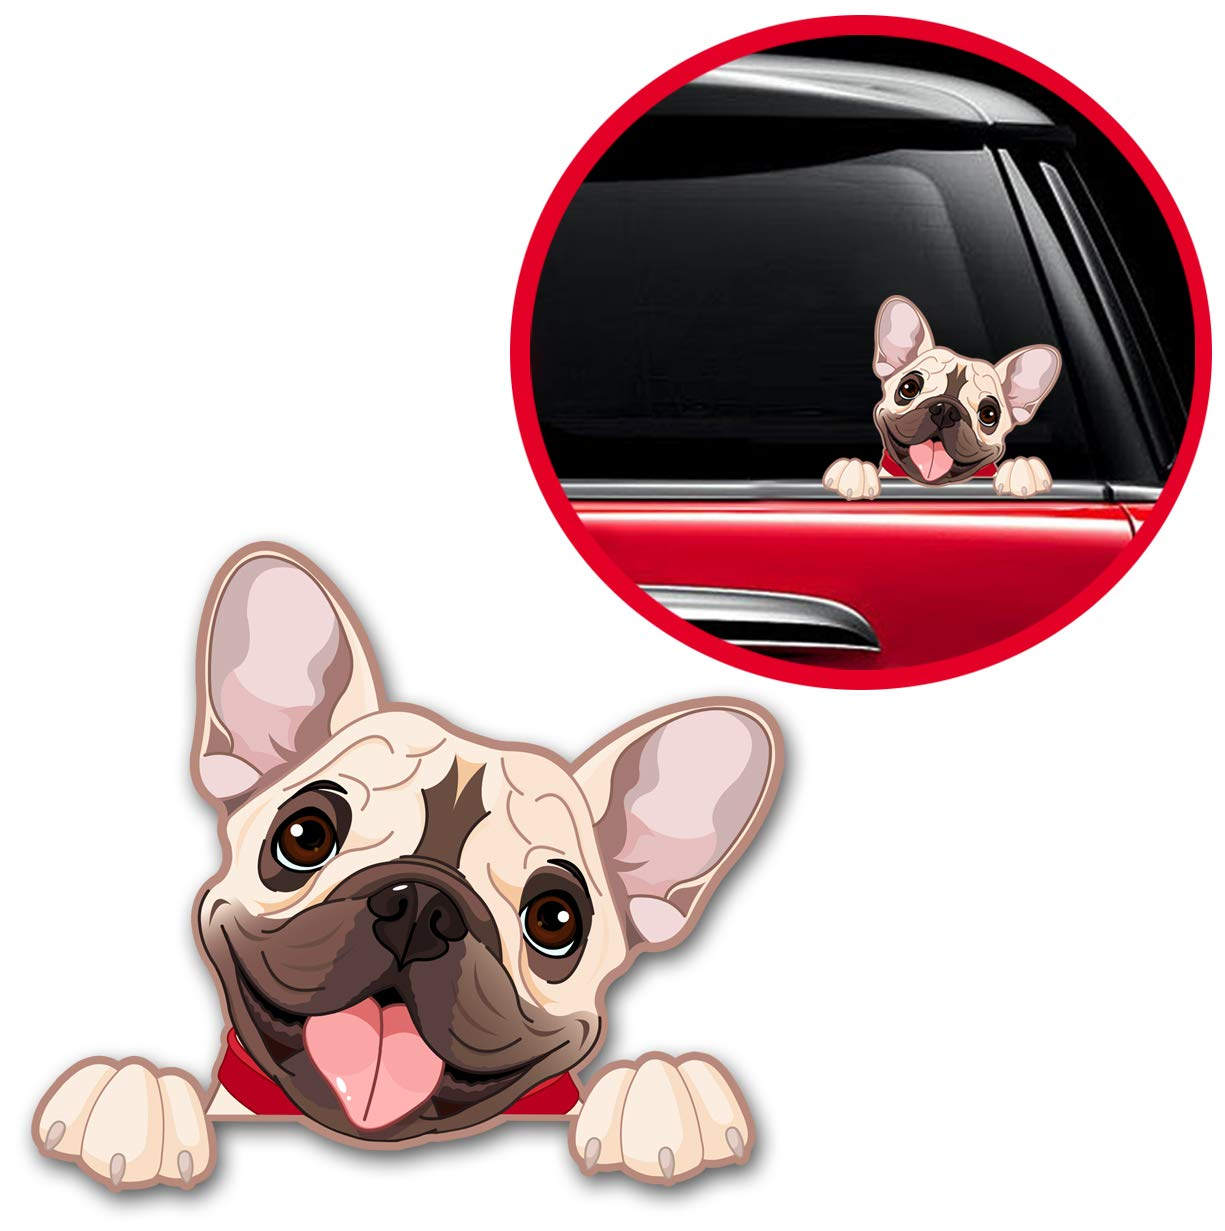 French Bulldog Dog Pet Sticker Decal Vinyl B 232